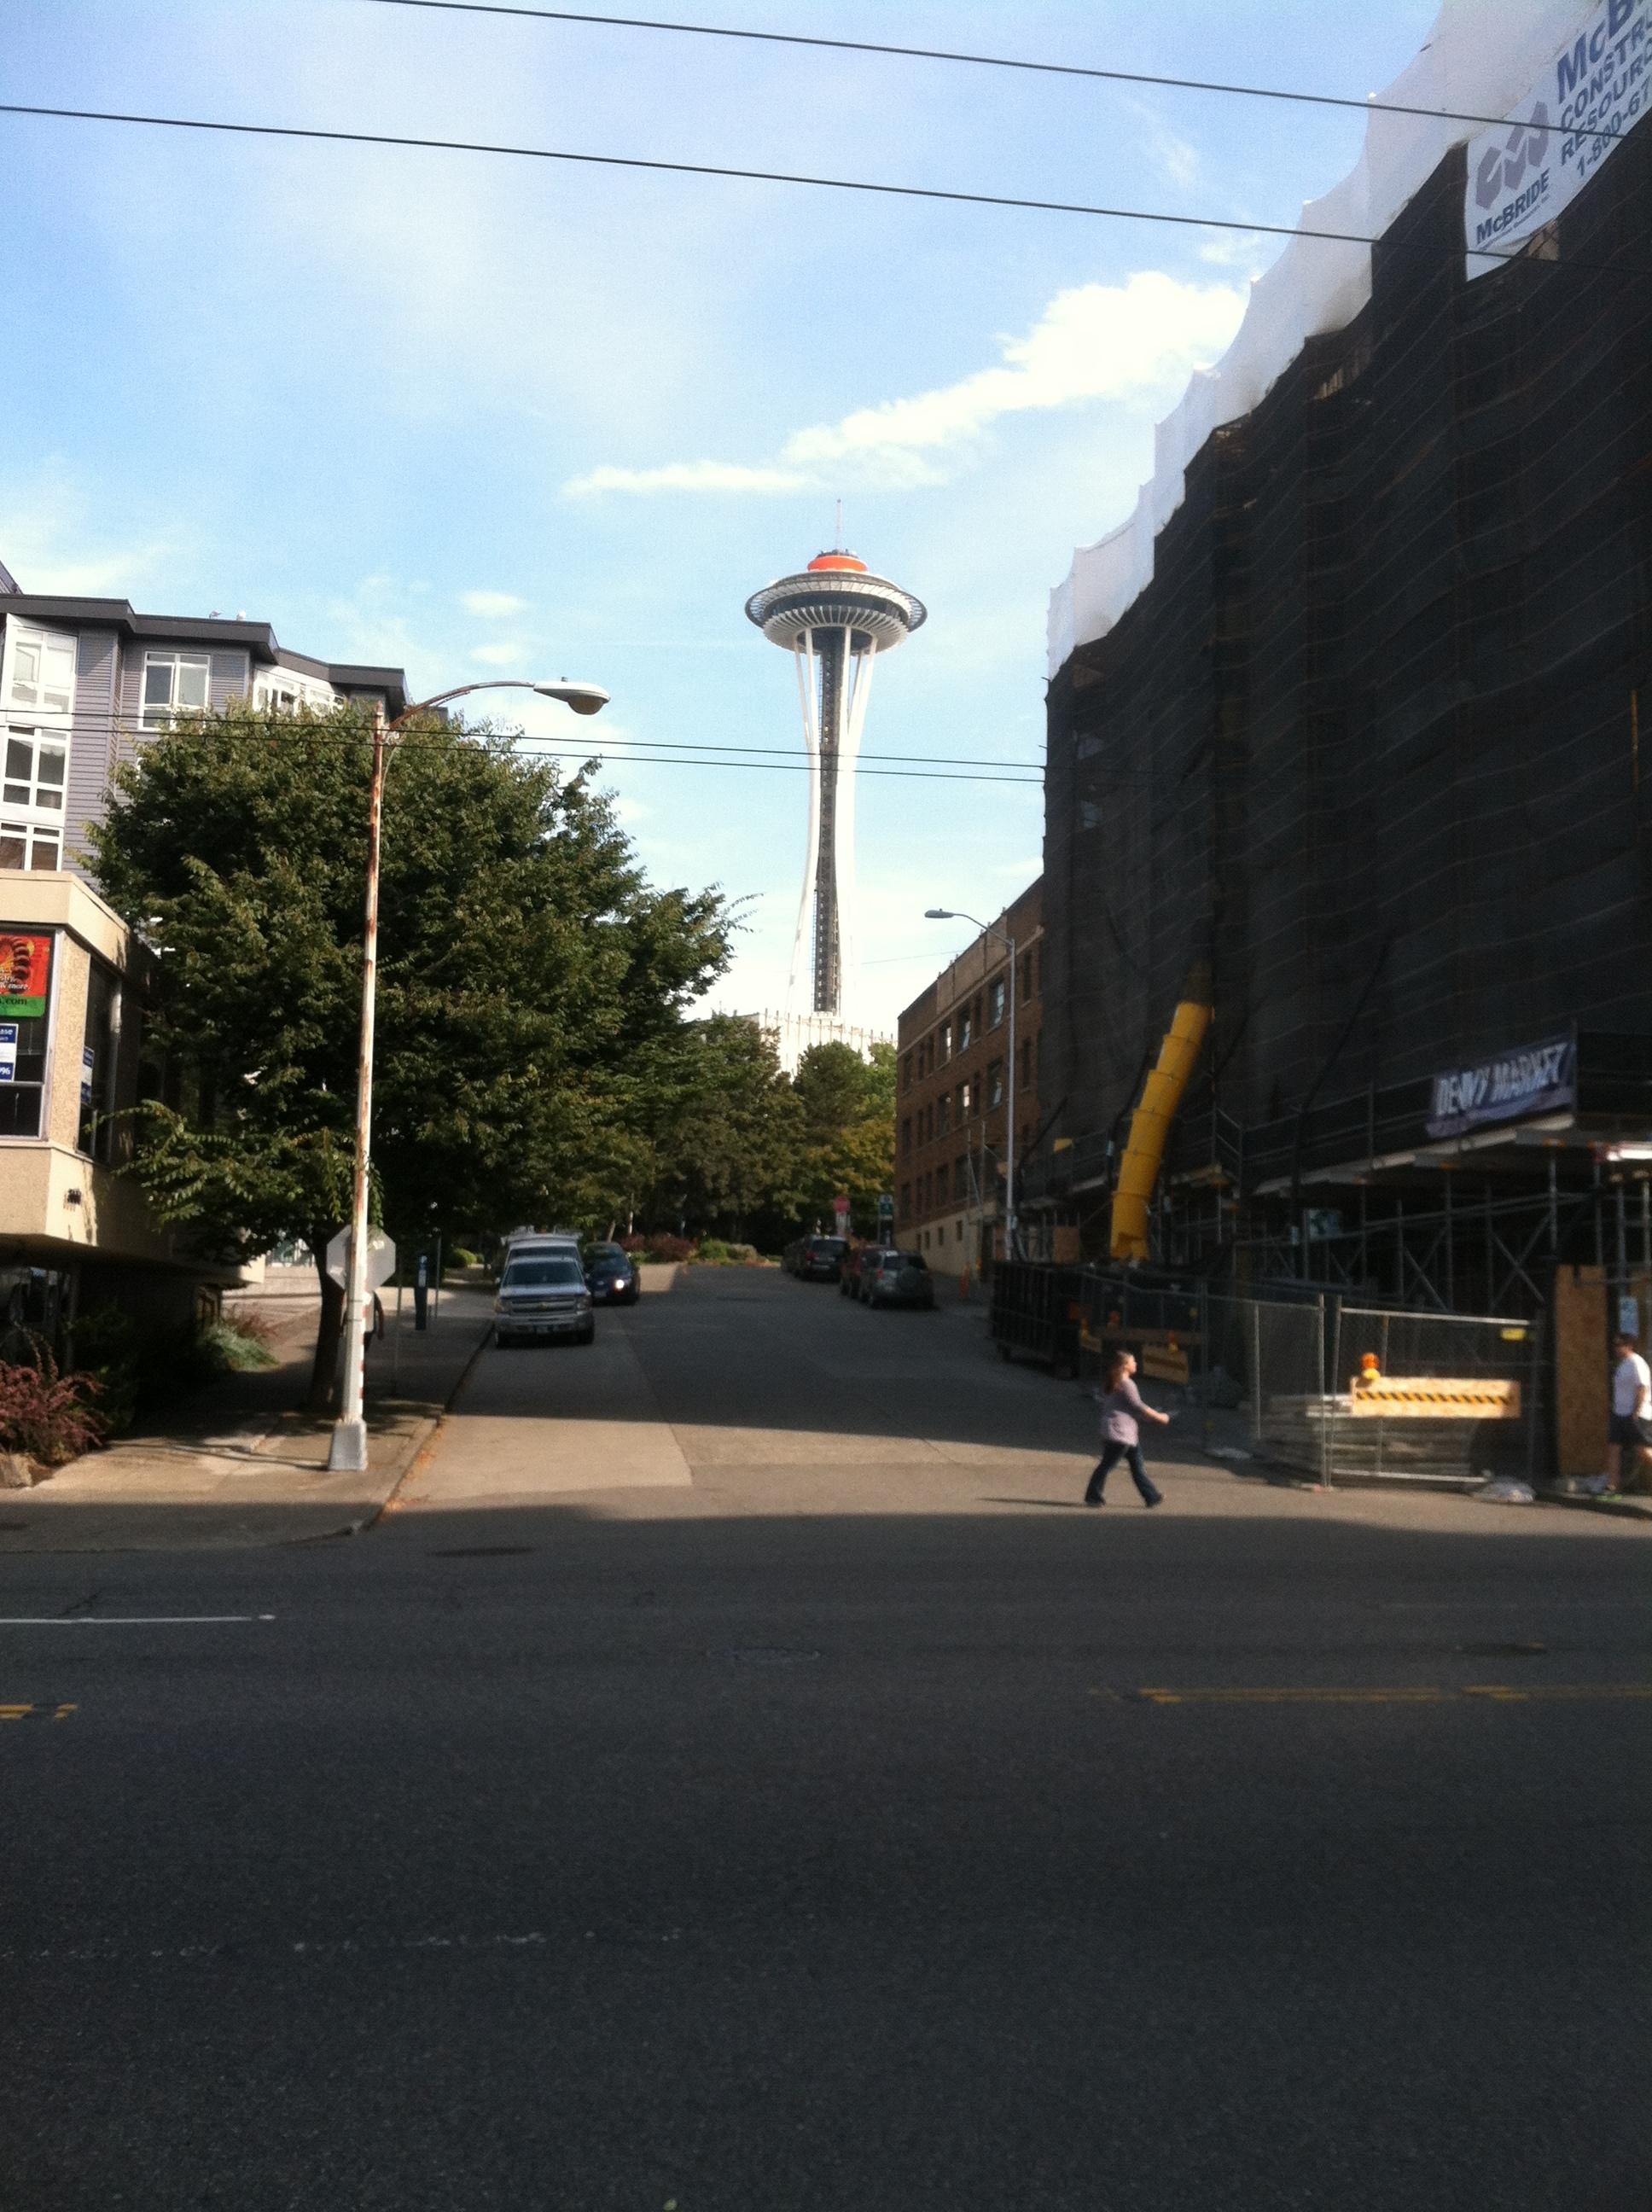 WASHINGTON -